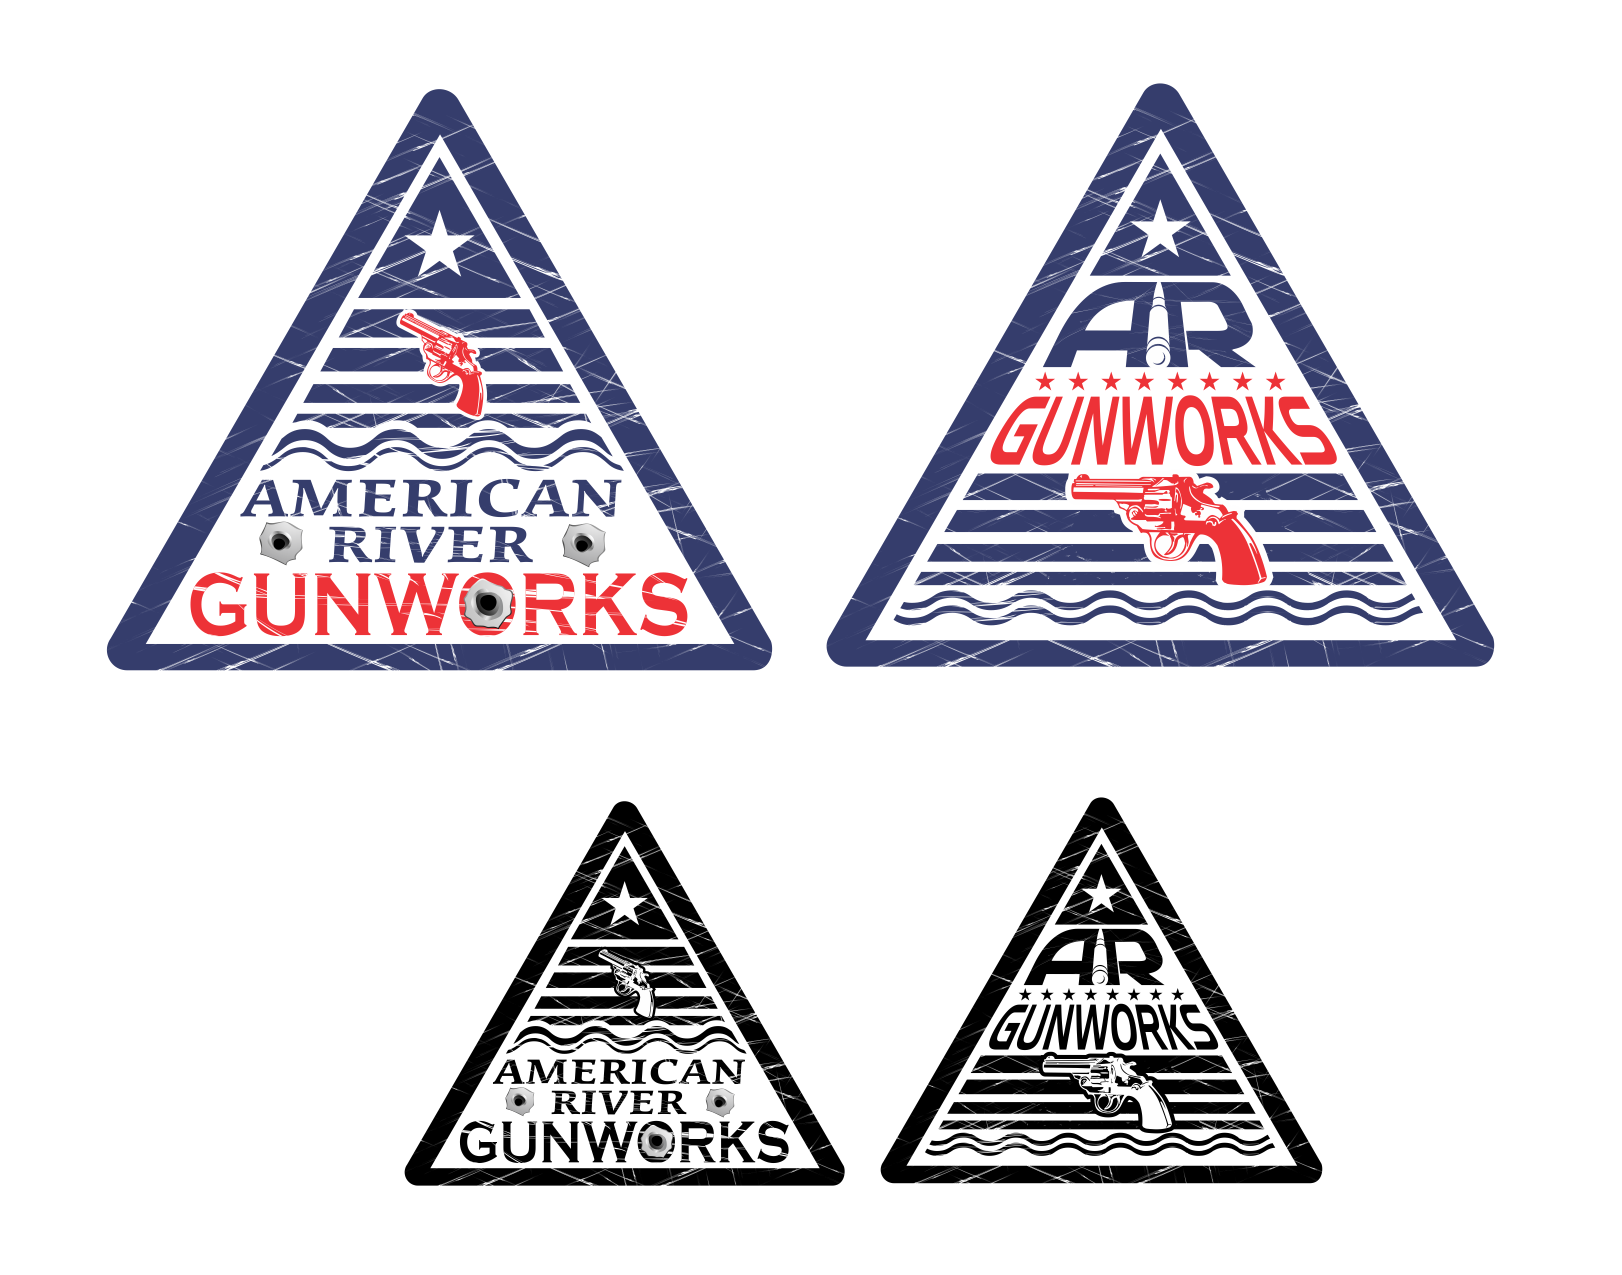 logo for American River Gunworks or AR Gunworks